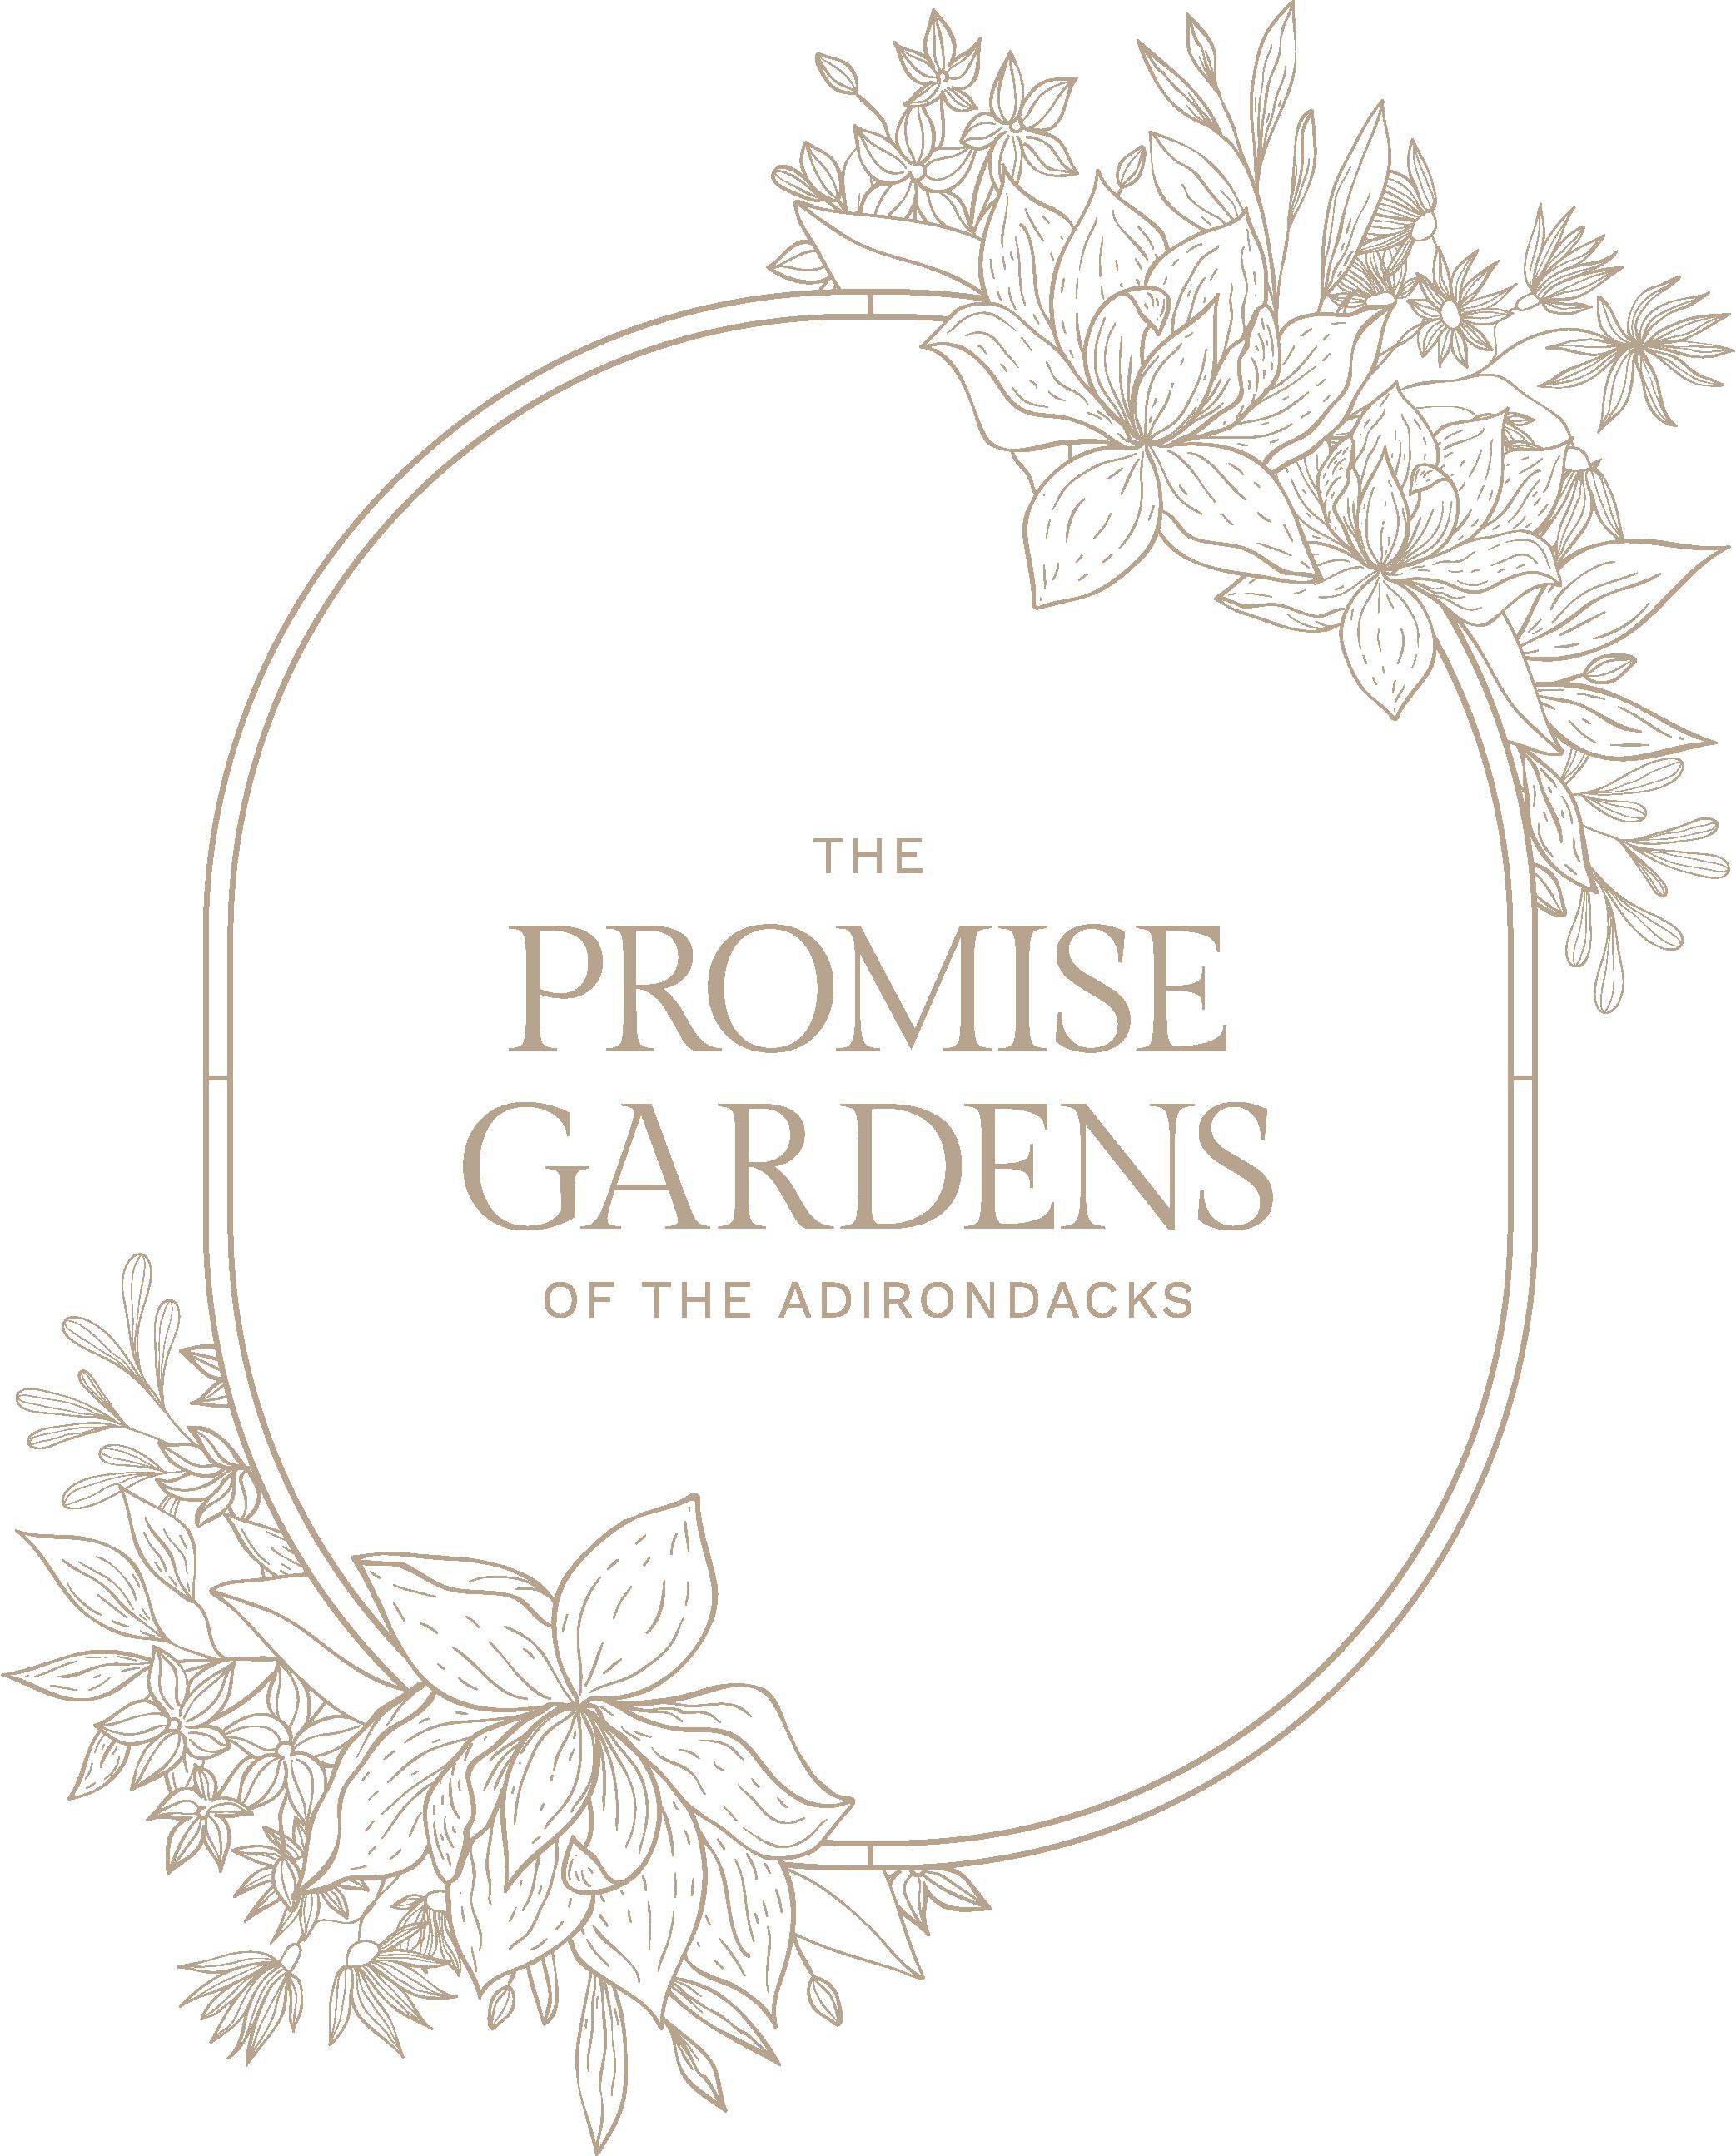 The Promise Gardens of the Adirondacks